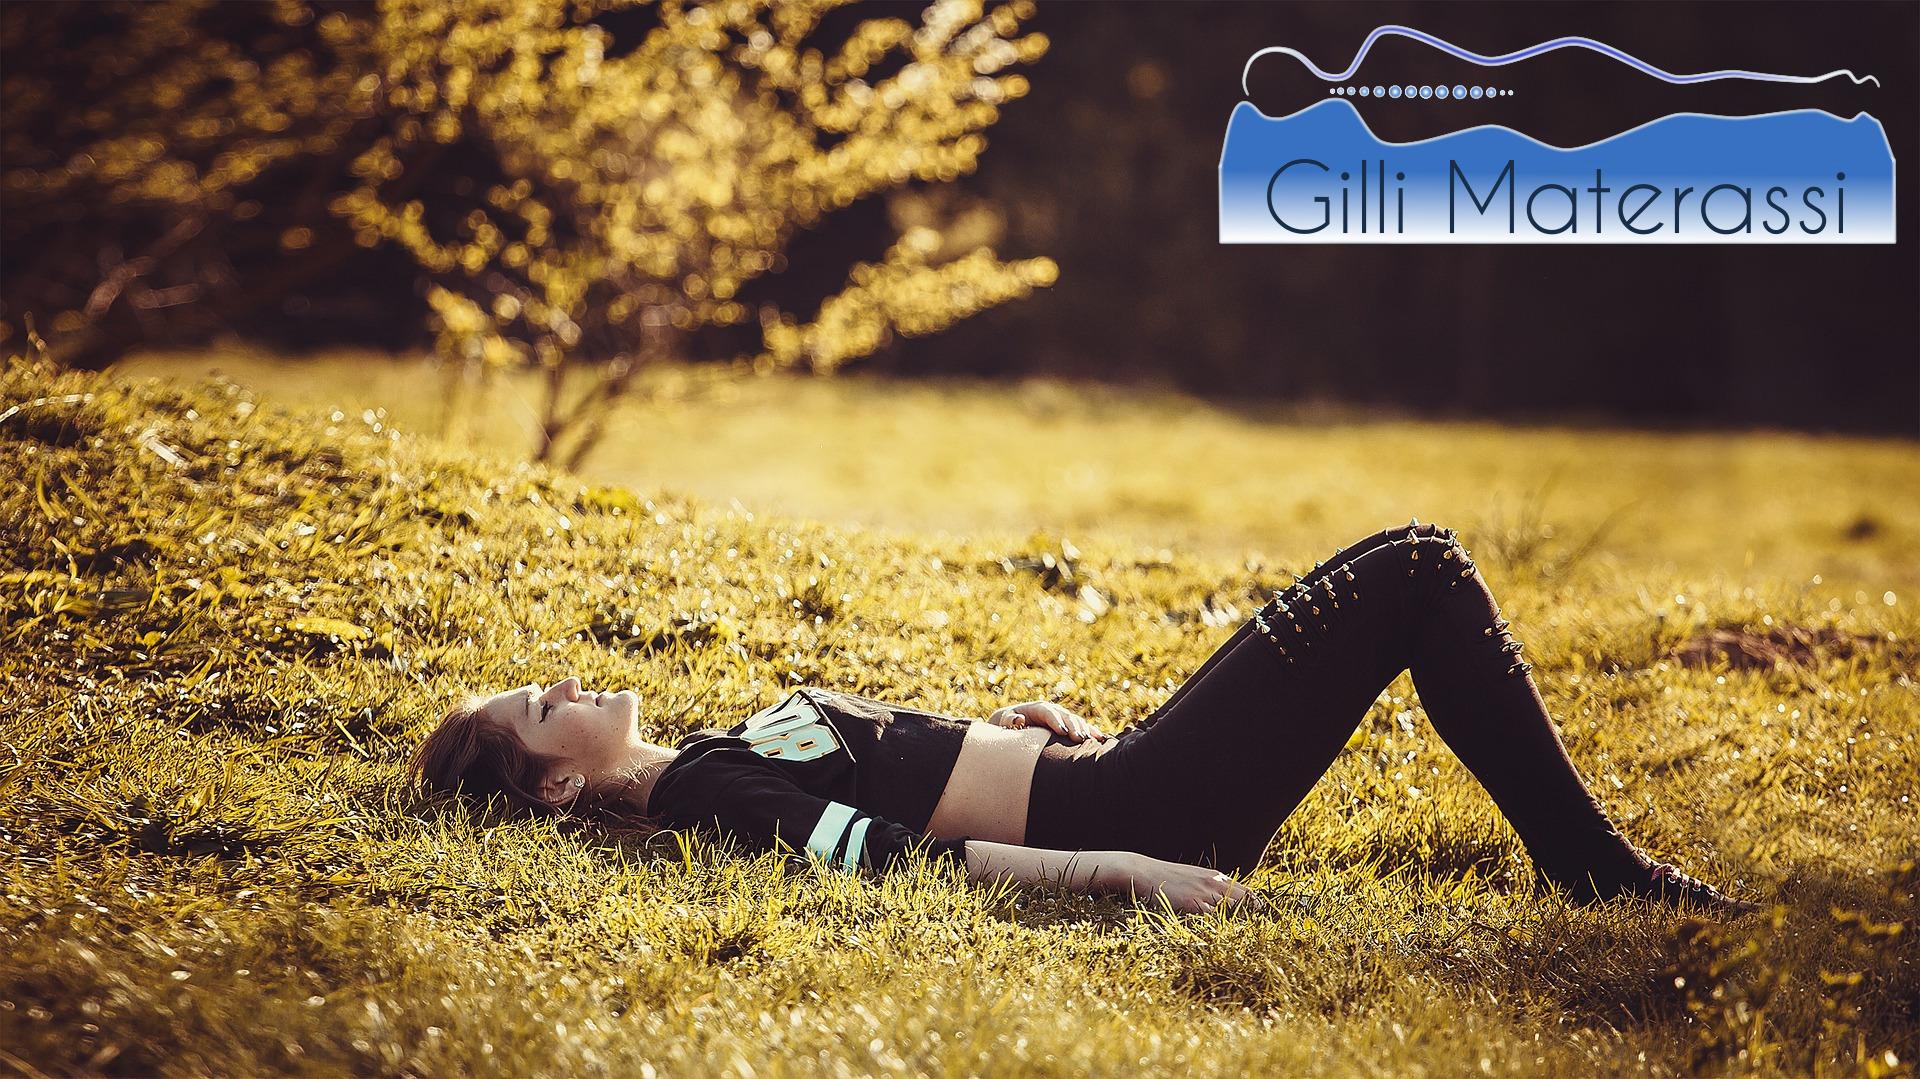 Da Gilli Materassi si respira già aria di PROMOvera!